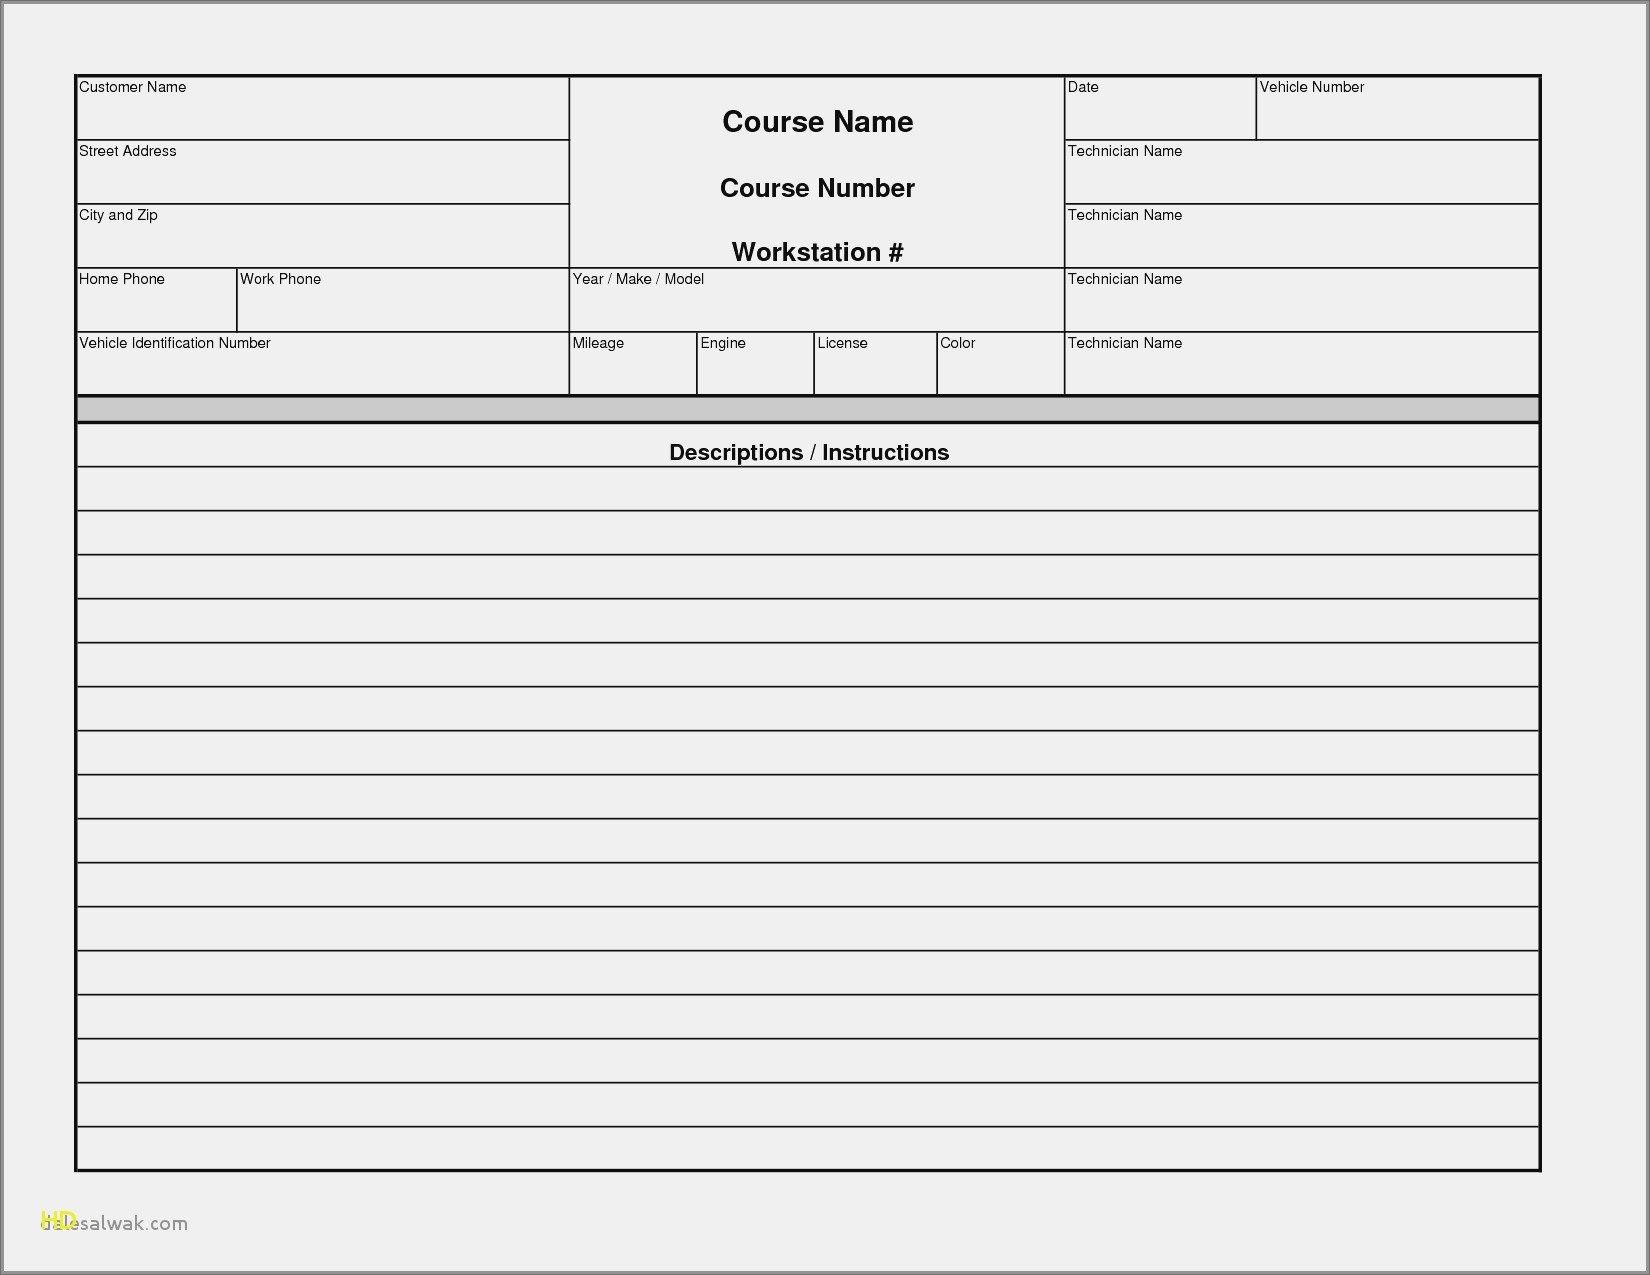 New Auto Repair Invoice Template Word  Mavensocialco For Auto Repair Invoice Template Word